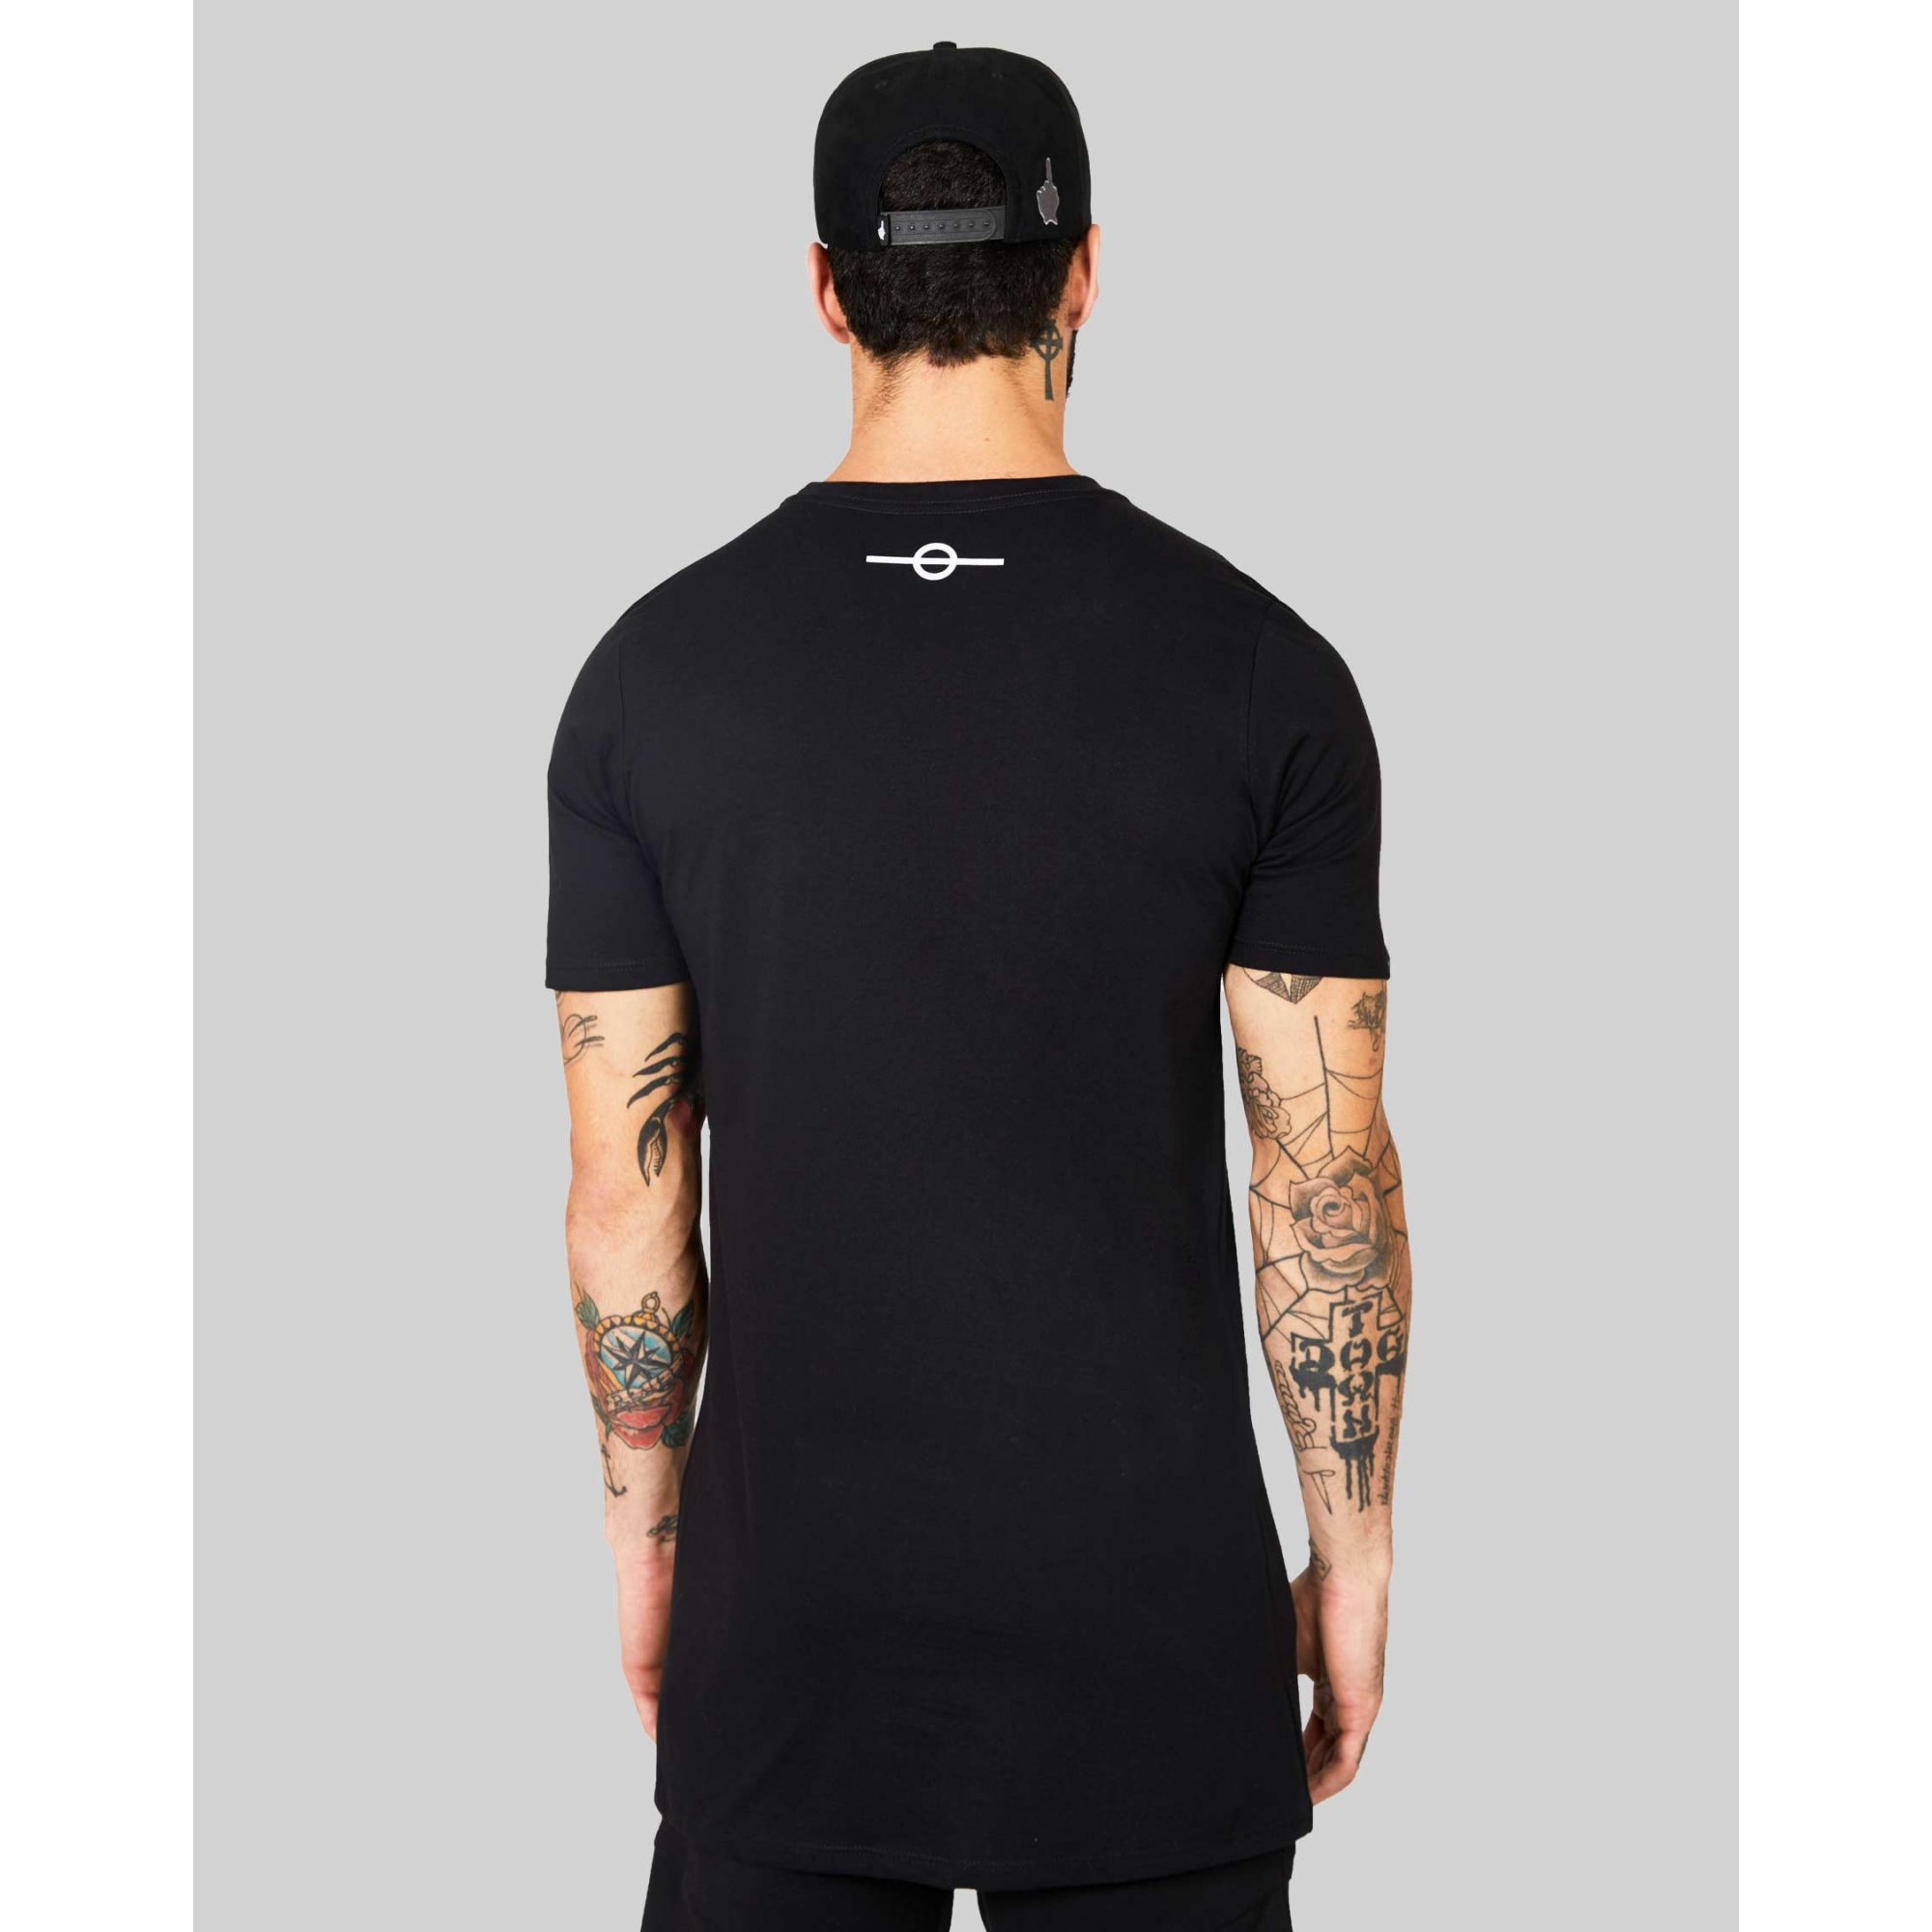 Camiseta Buh Placa Gomo Black